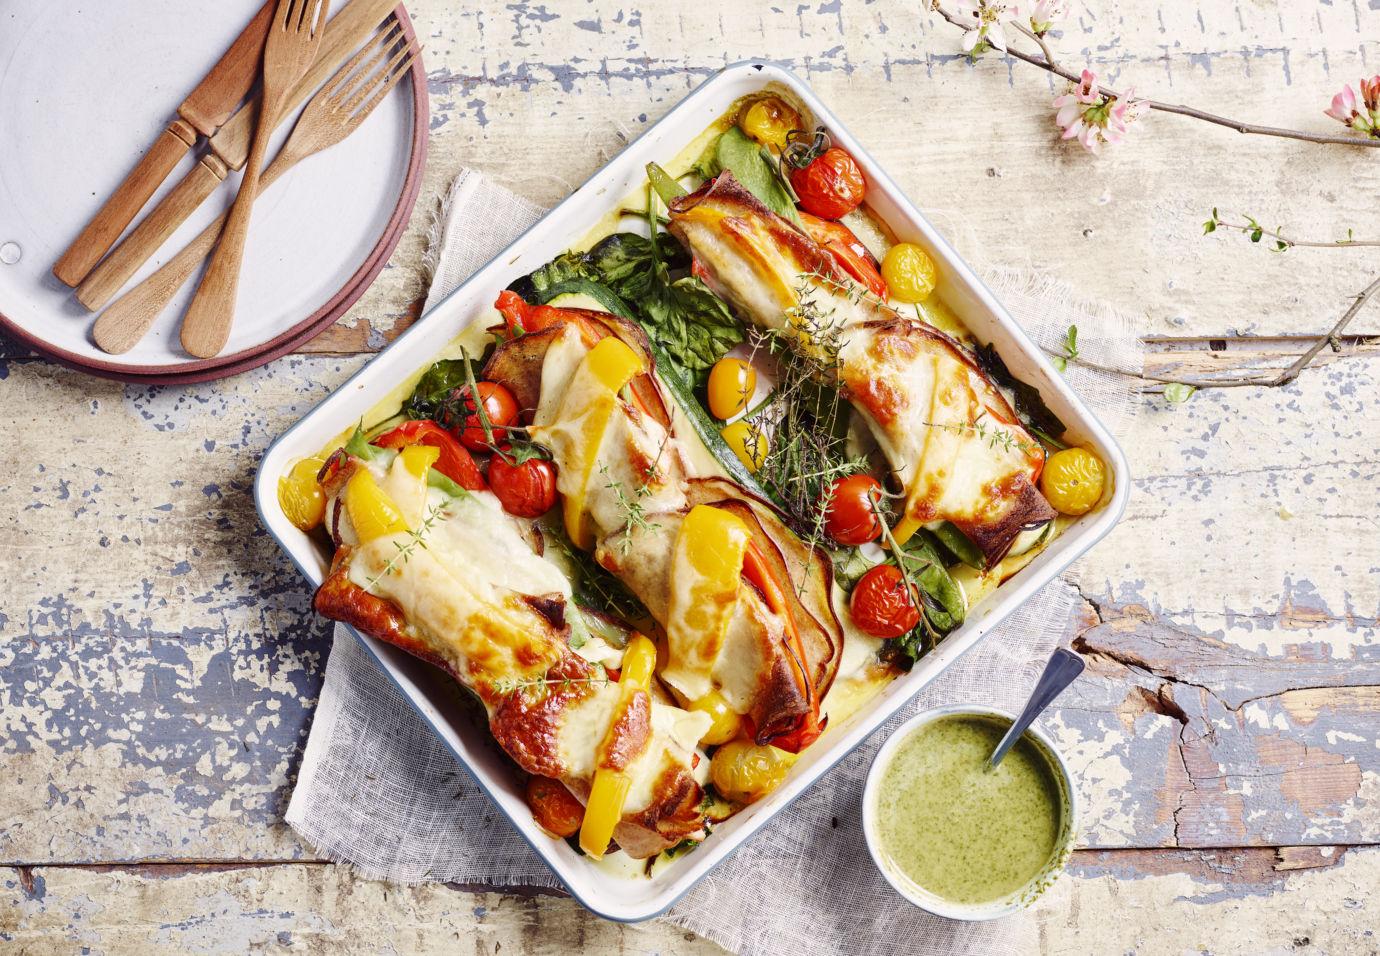 Zomerse groentelasagne van paprika, snijbonen, mozzarella en vleesbrood